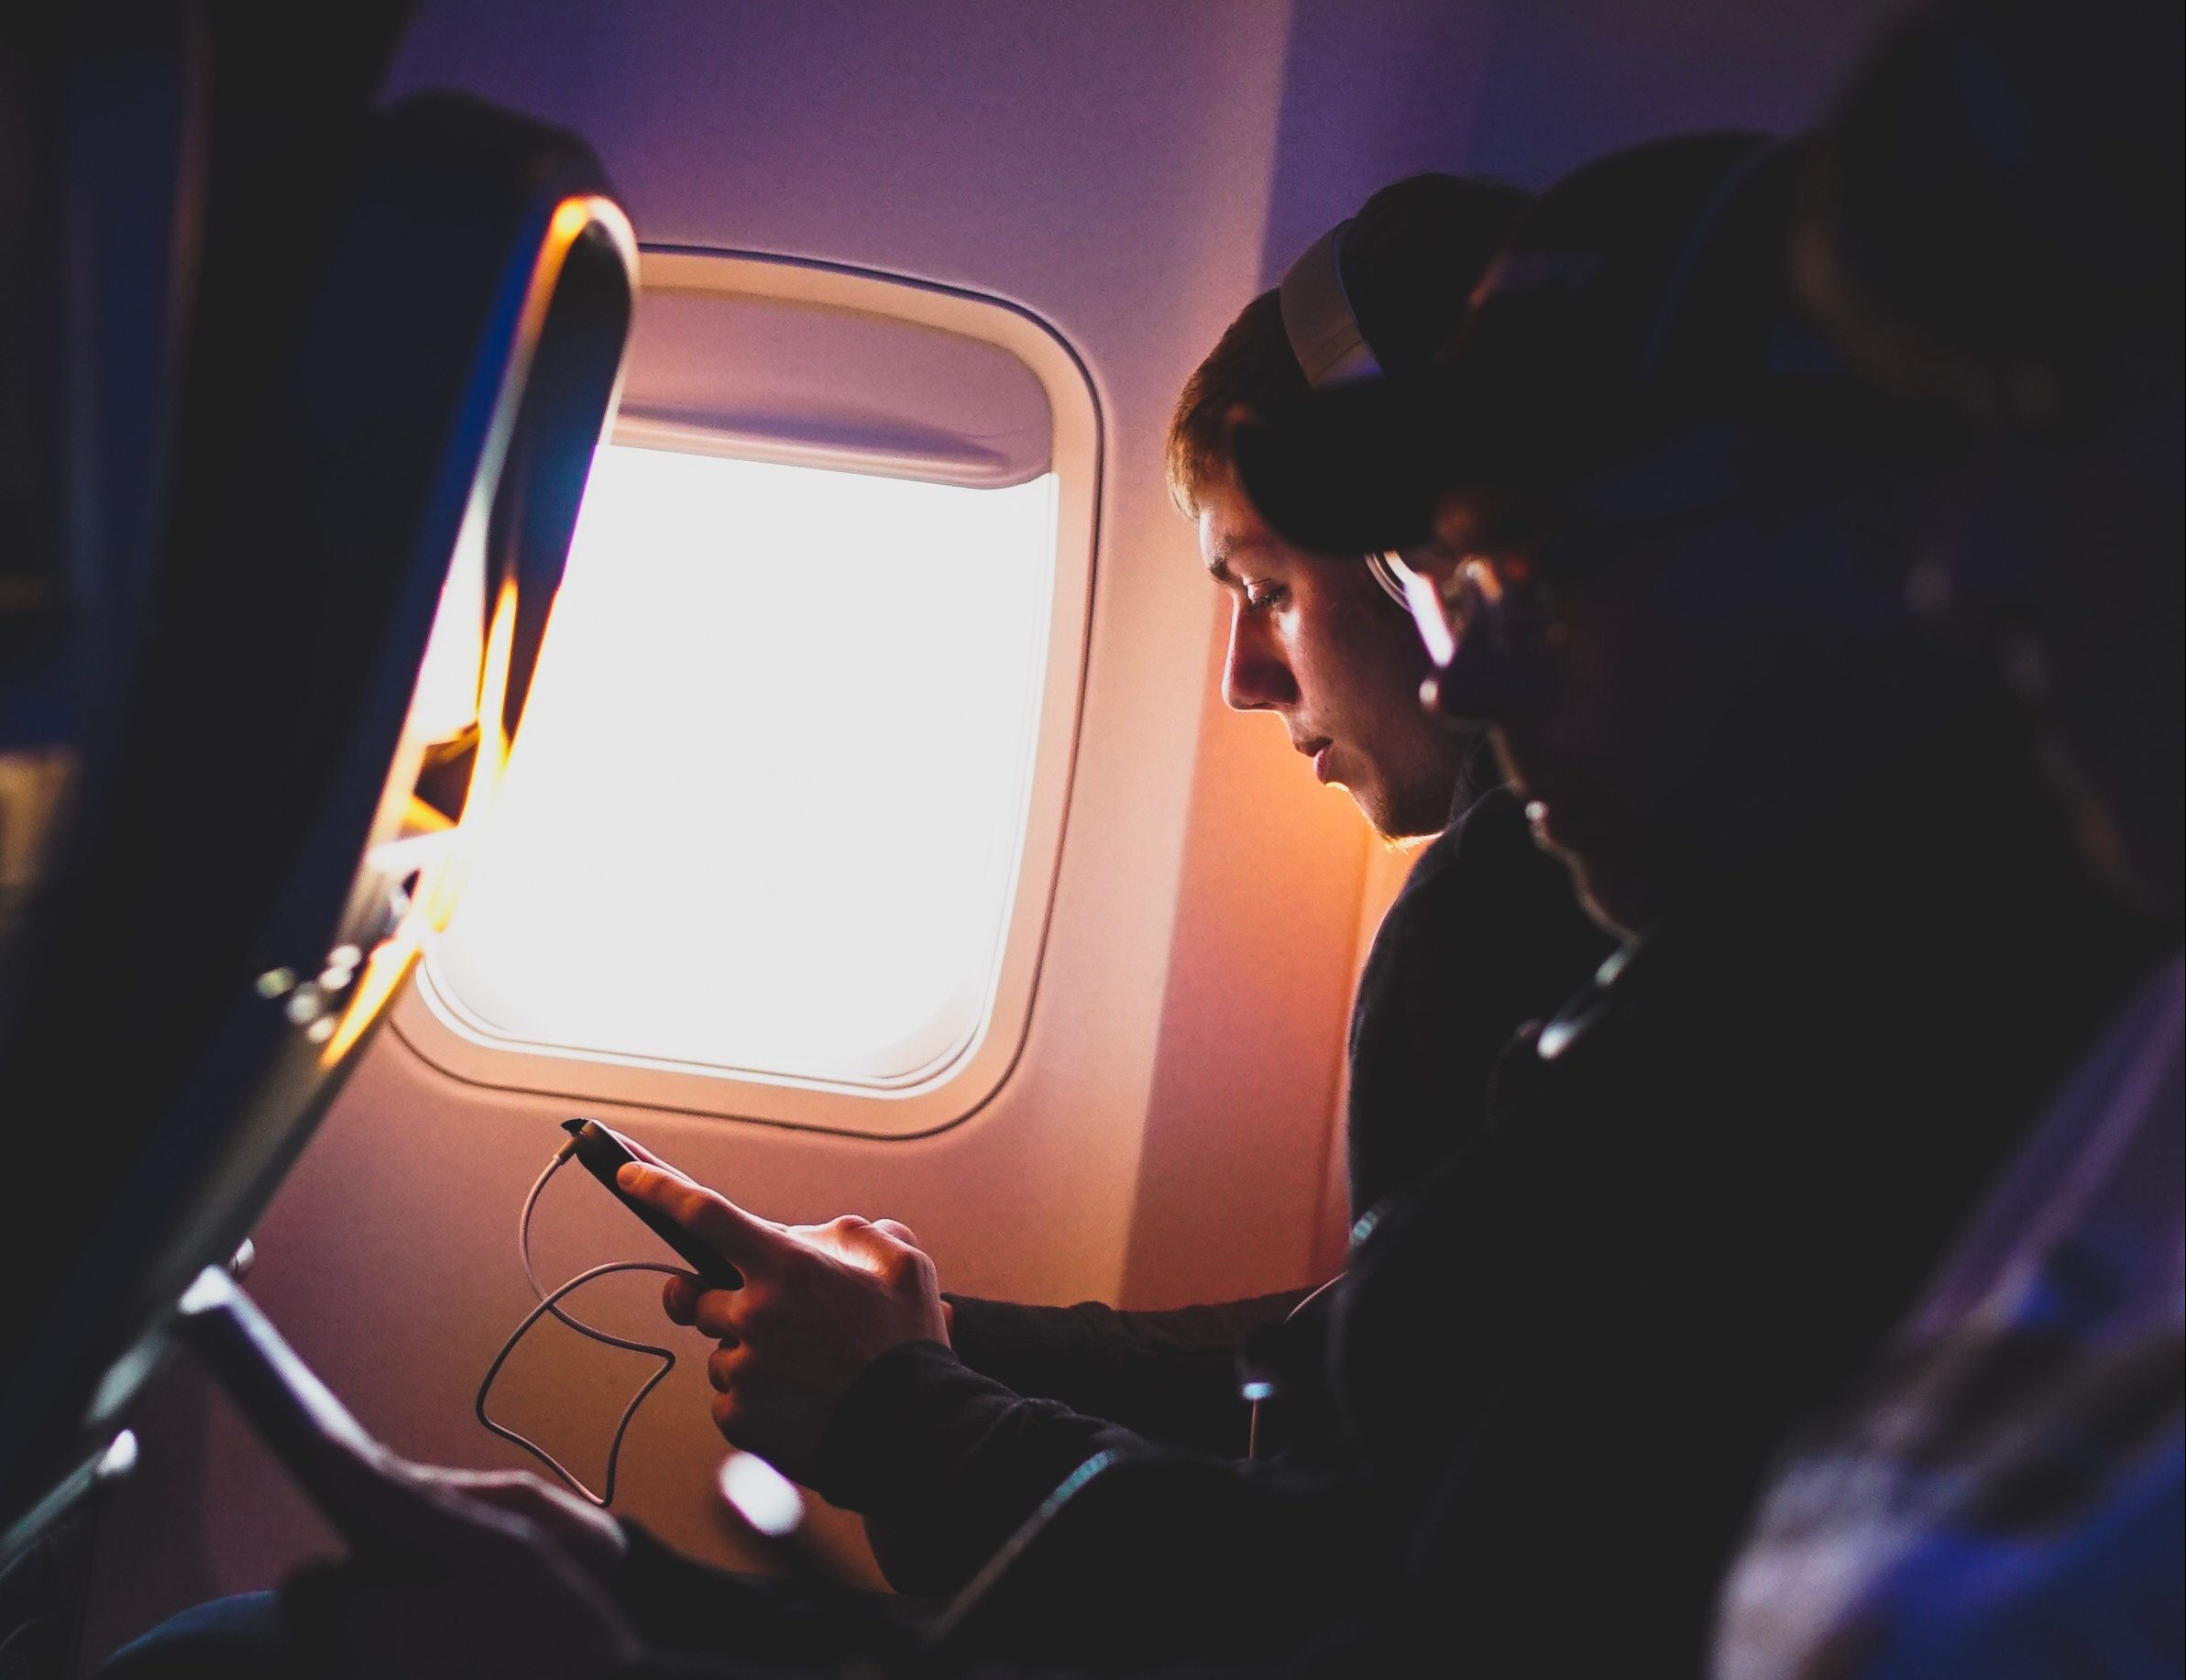 koptelefoon vliegtuig